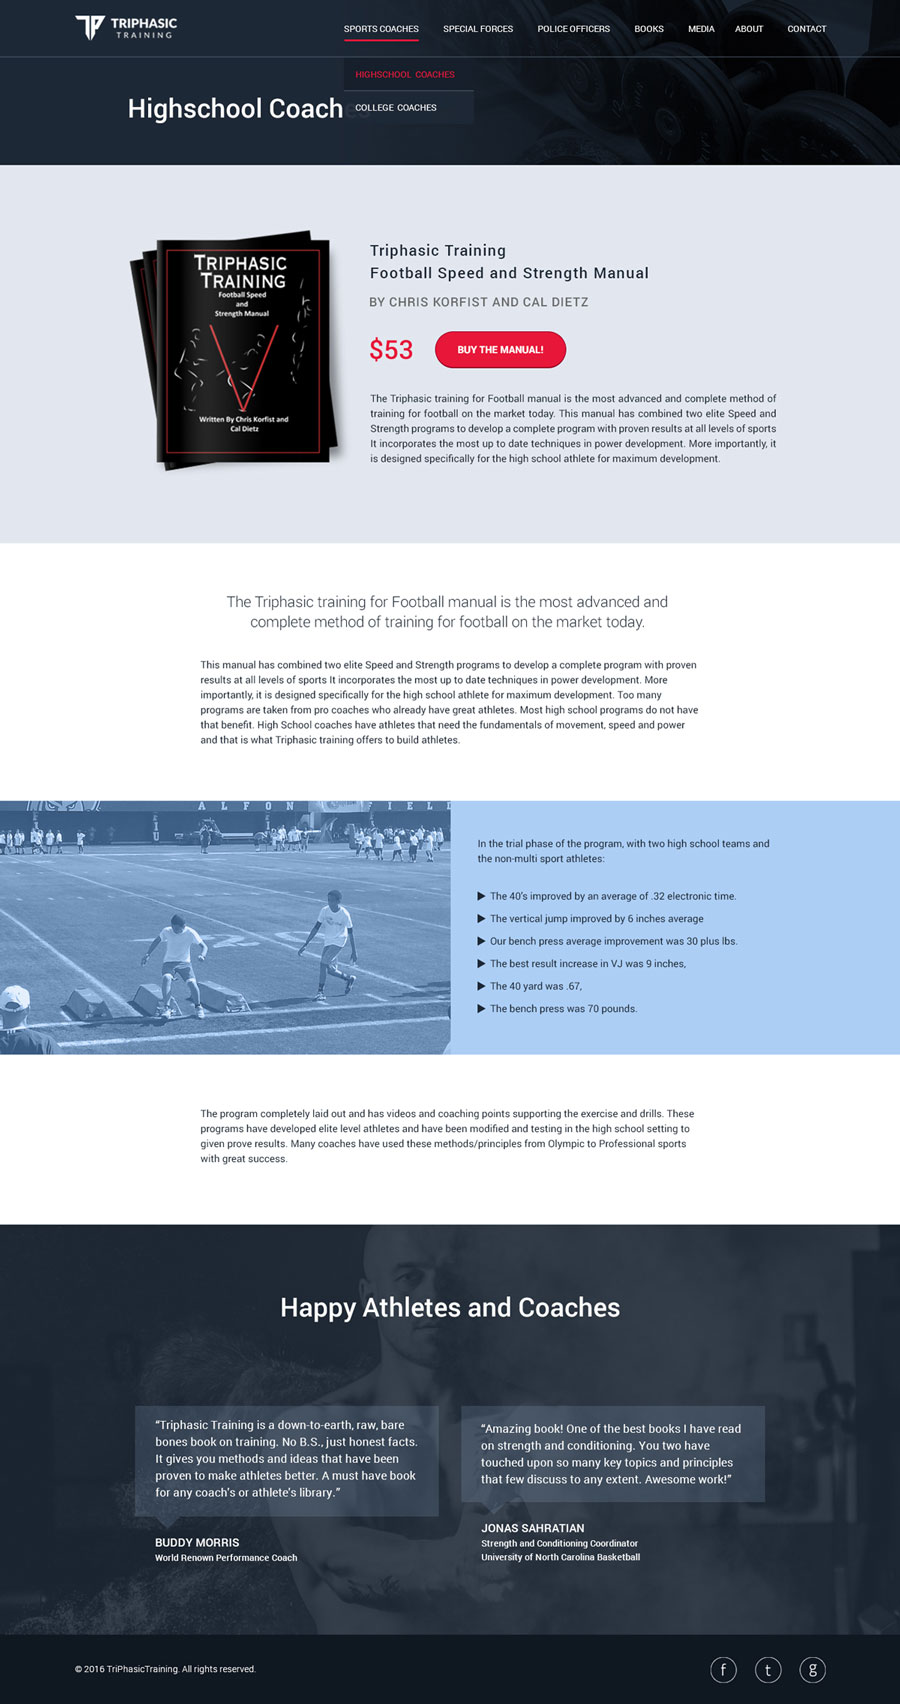 TPT-website-Highschool-Coaches